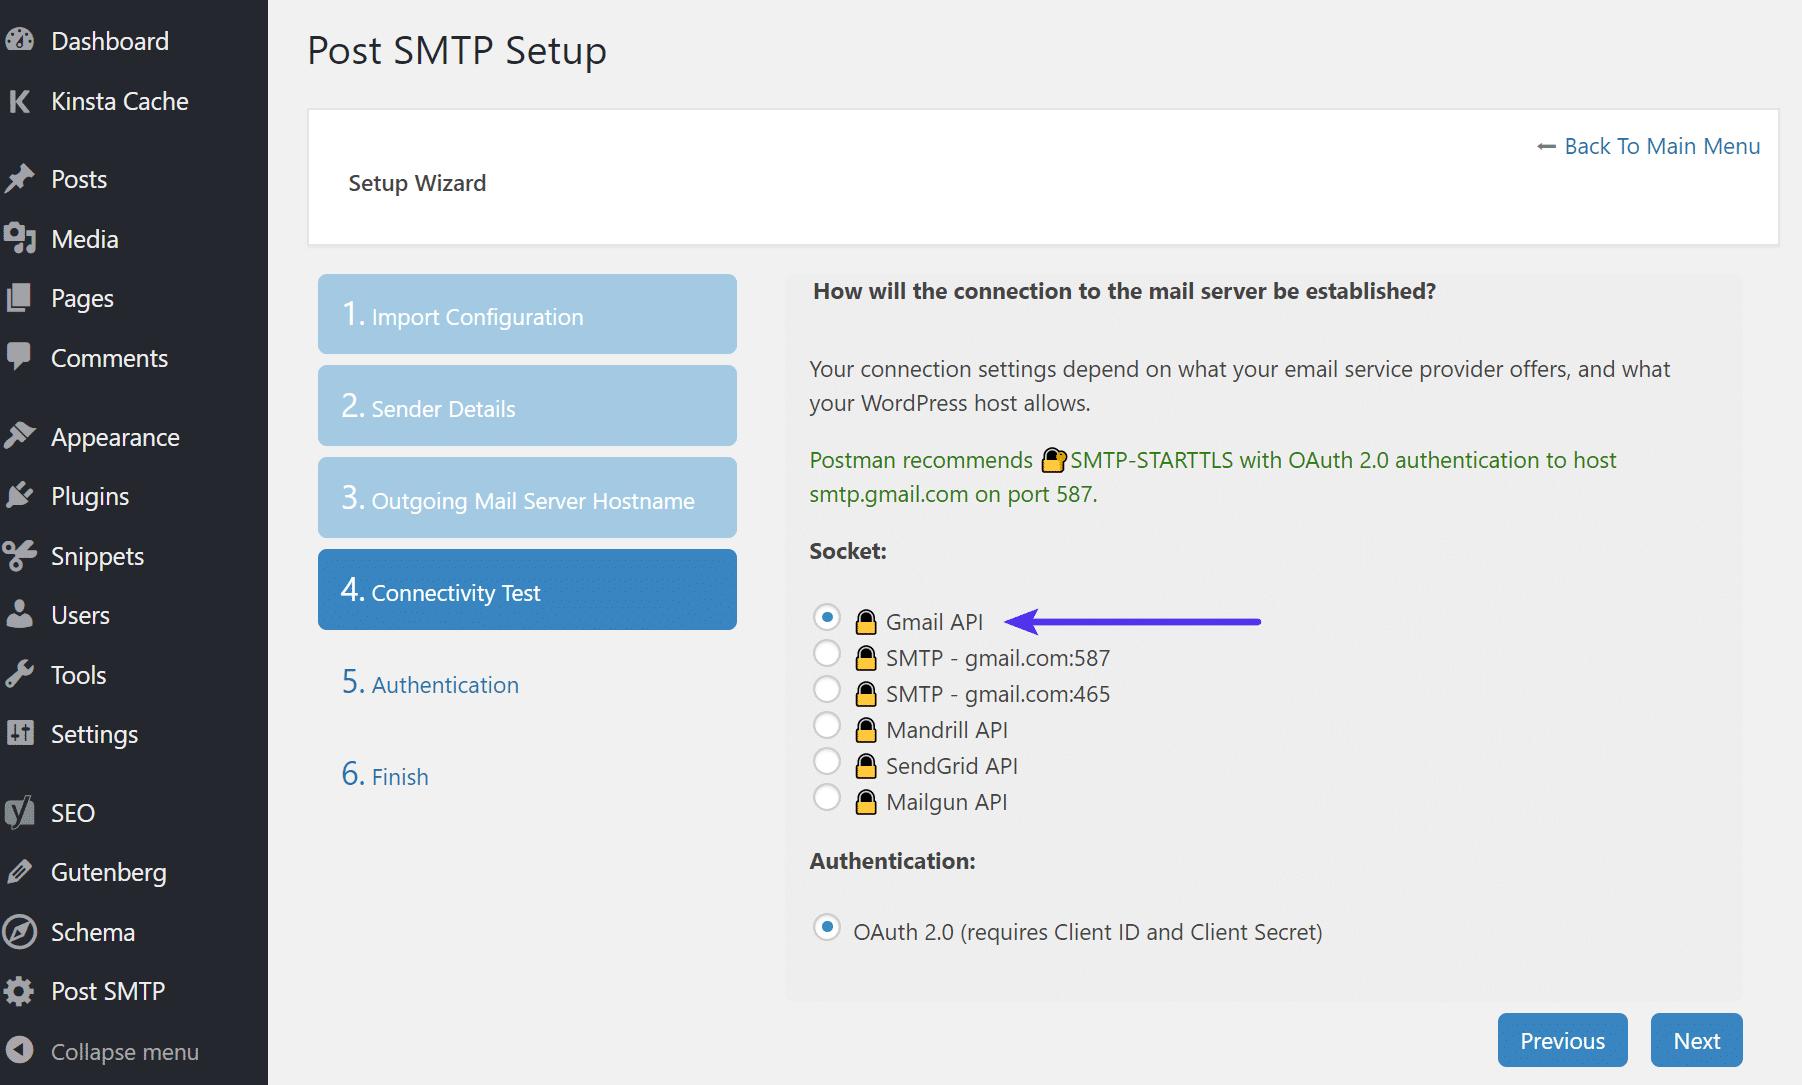 API di Gmail in Post SMTP